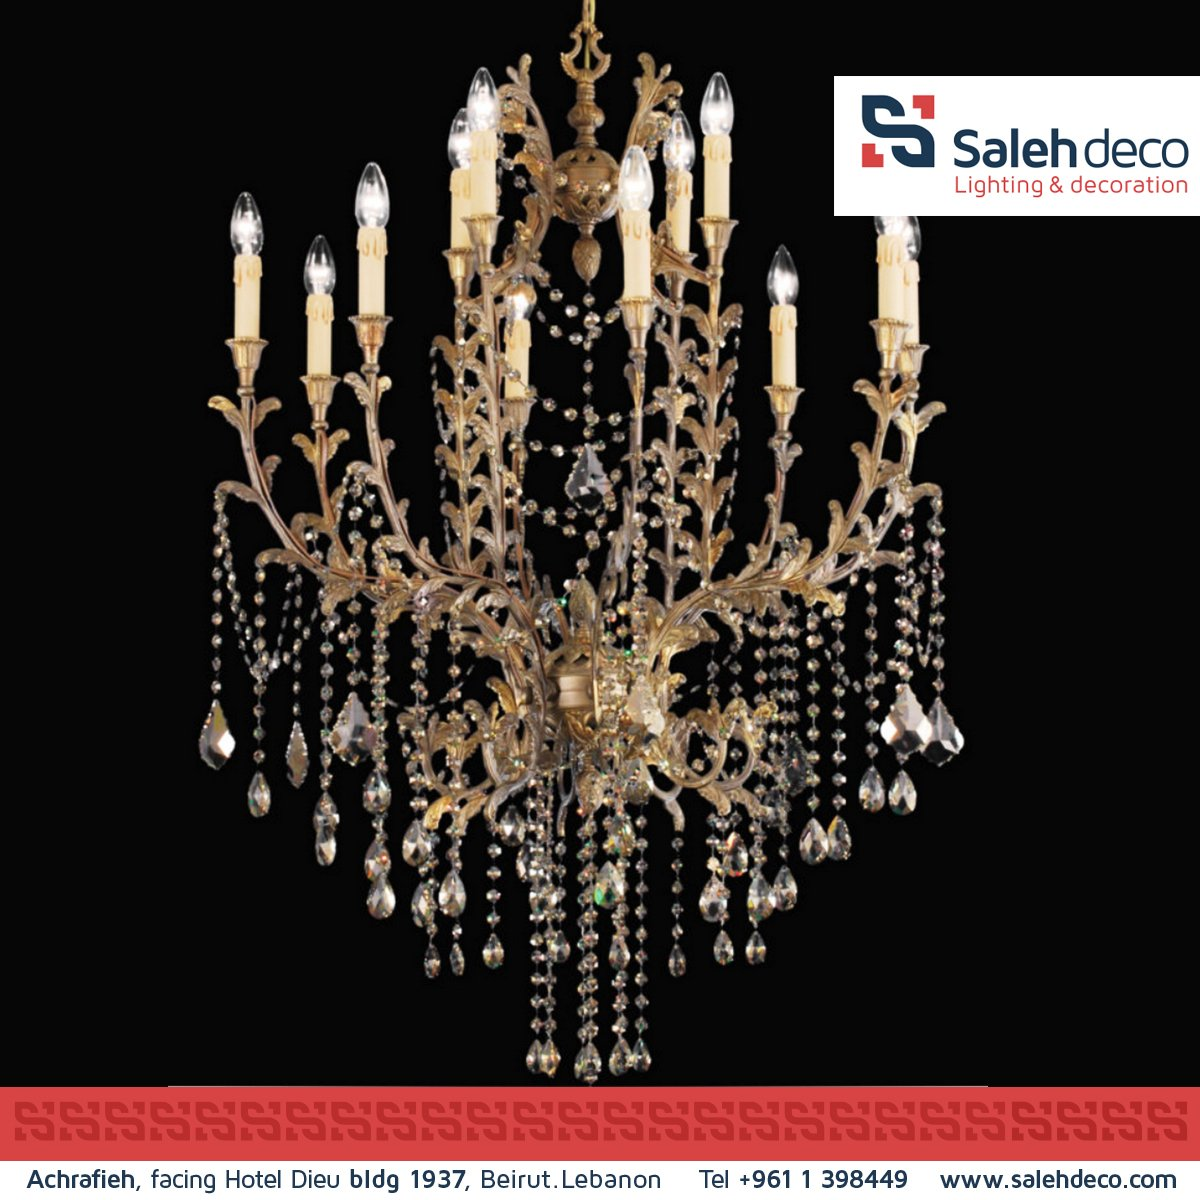 Luxury Speaks out loud! #lighting #decor #architct #architecture #interior #style #homedecor #design #art #salehdeco https://t.co/wl7KxuUqug